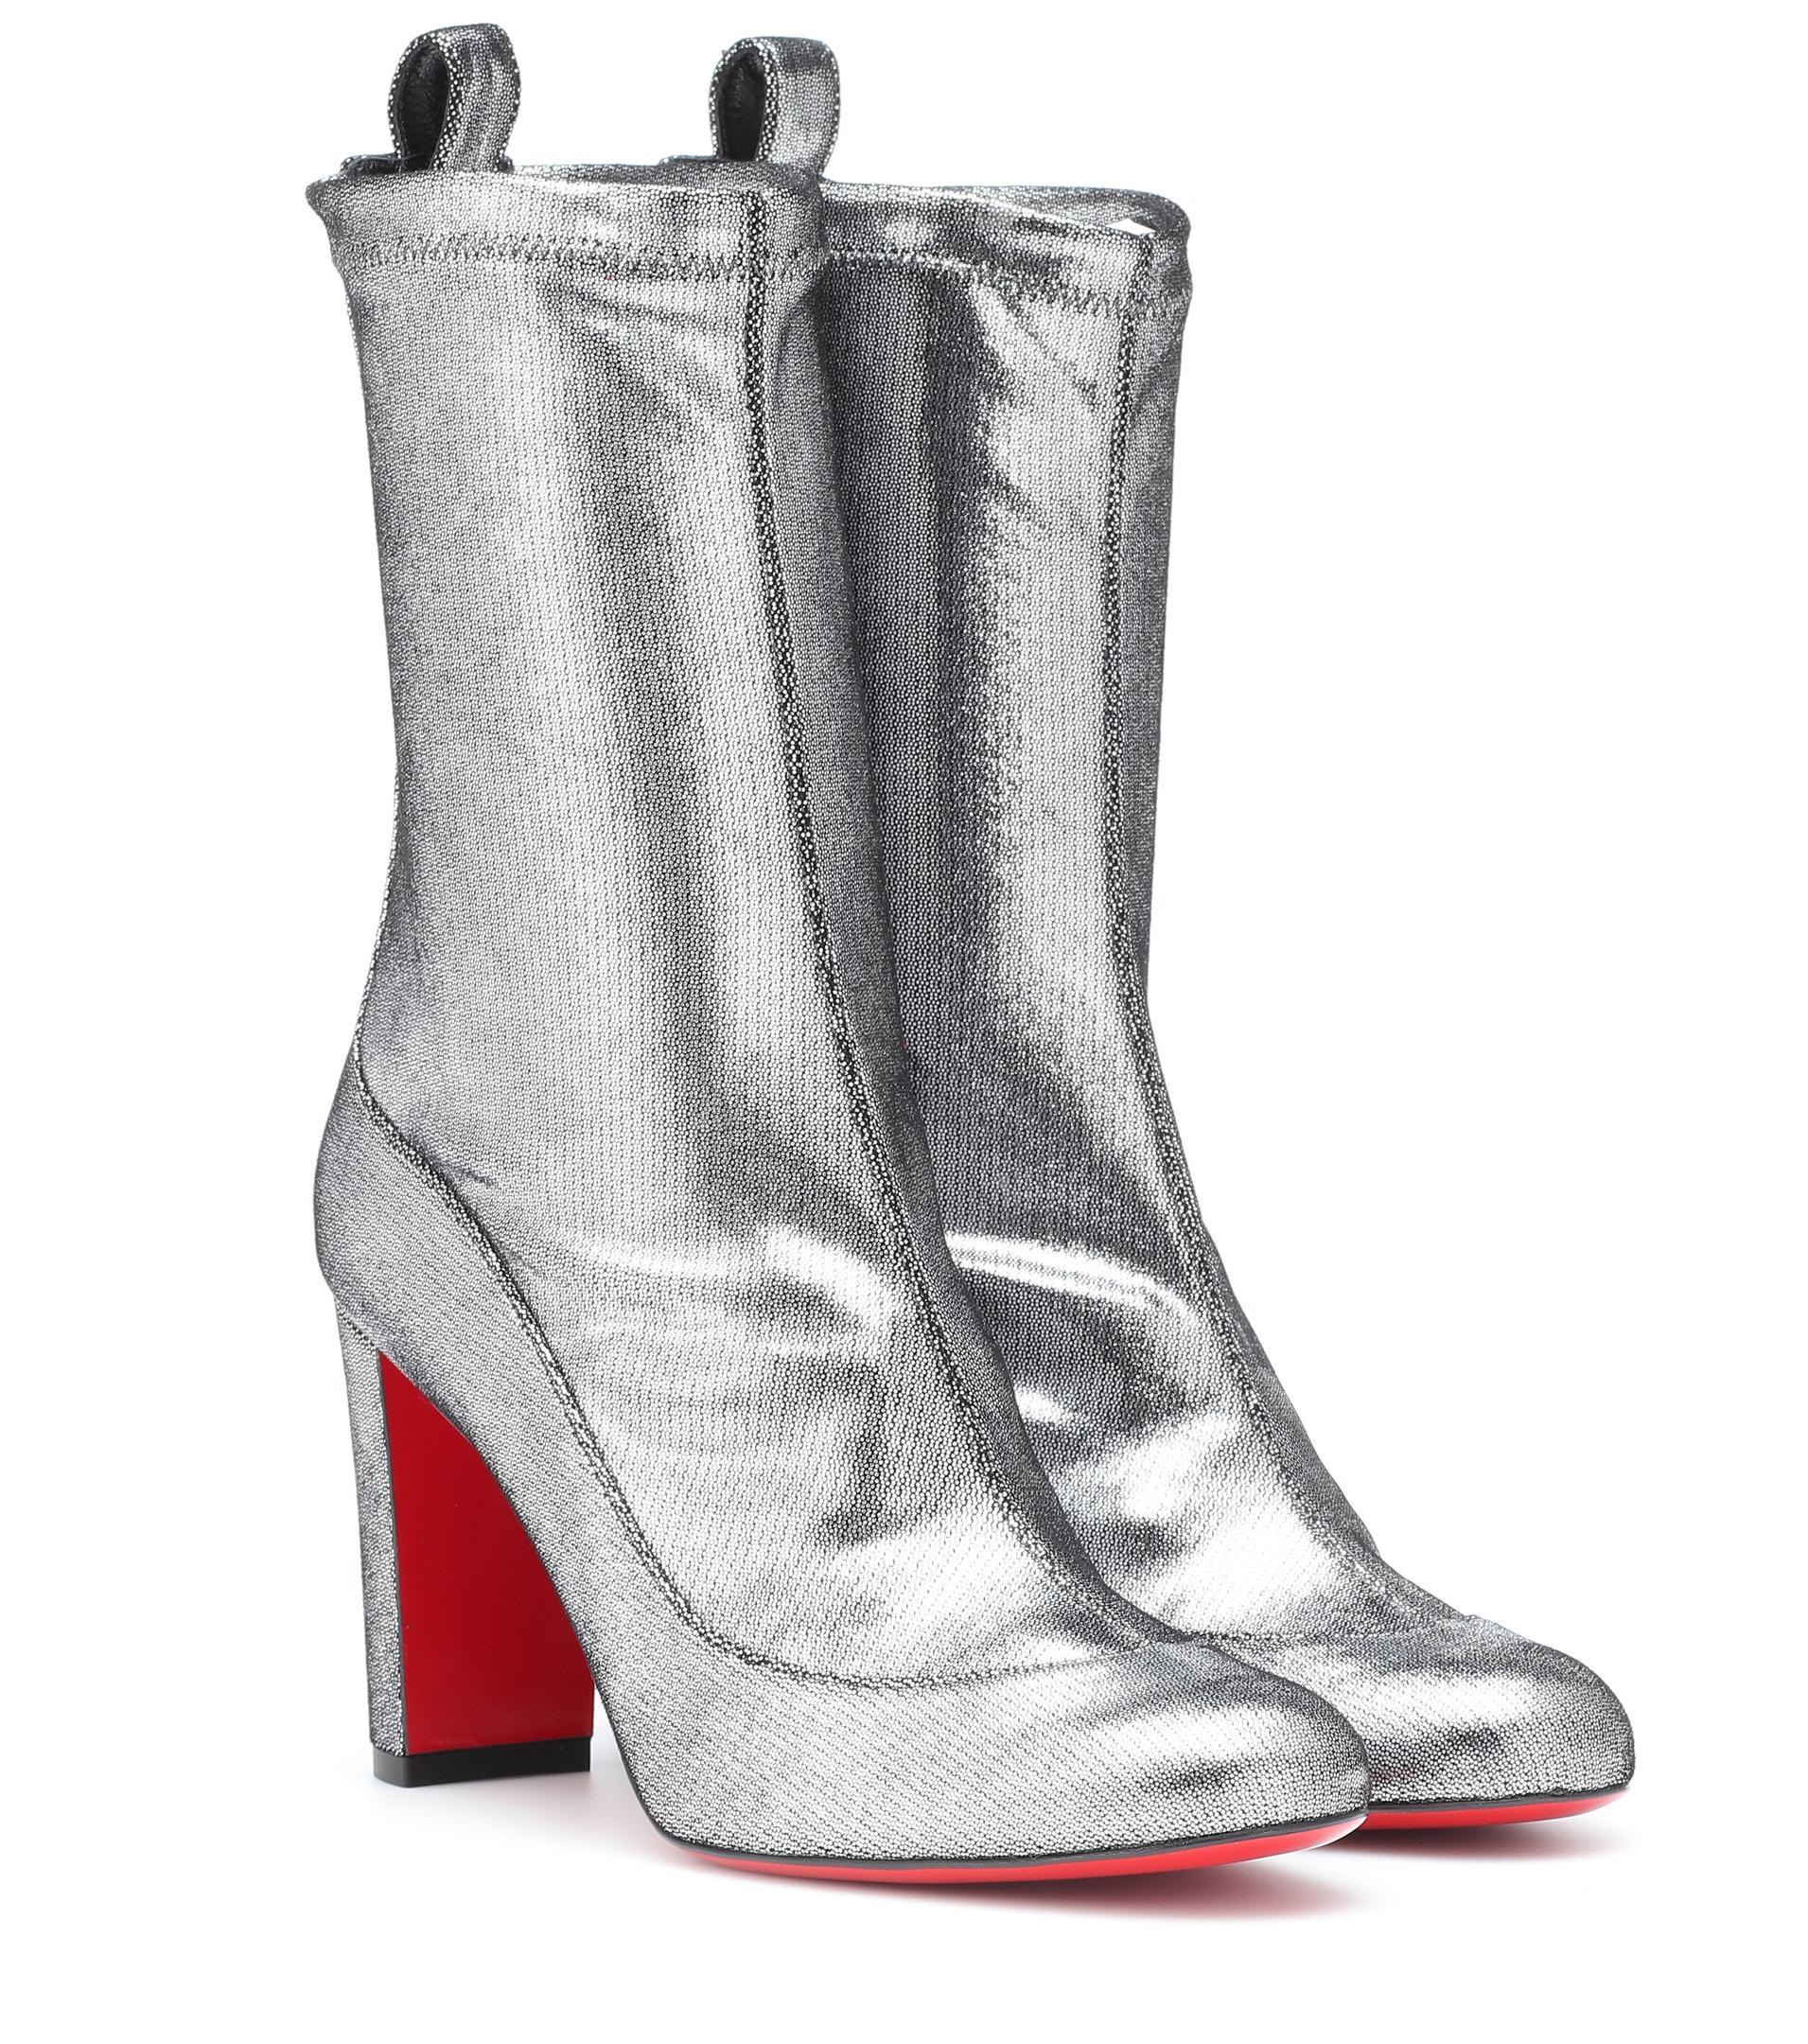 57ede46e009d Lyst - Christian Louboutin Gena 85 Metallic Leather Boots in Metallic